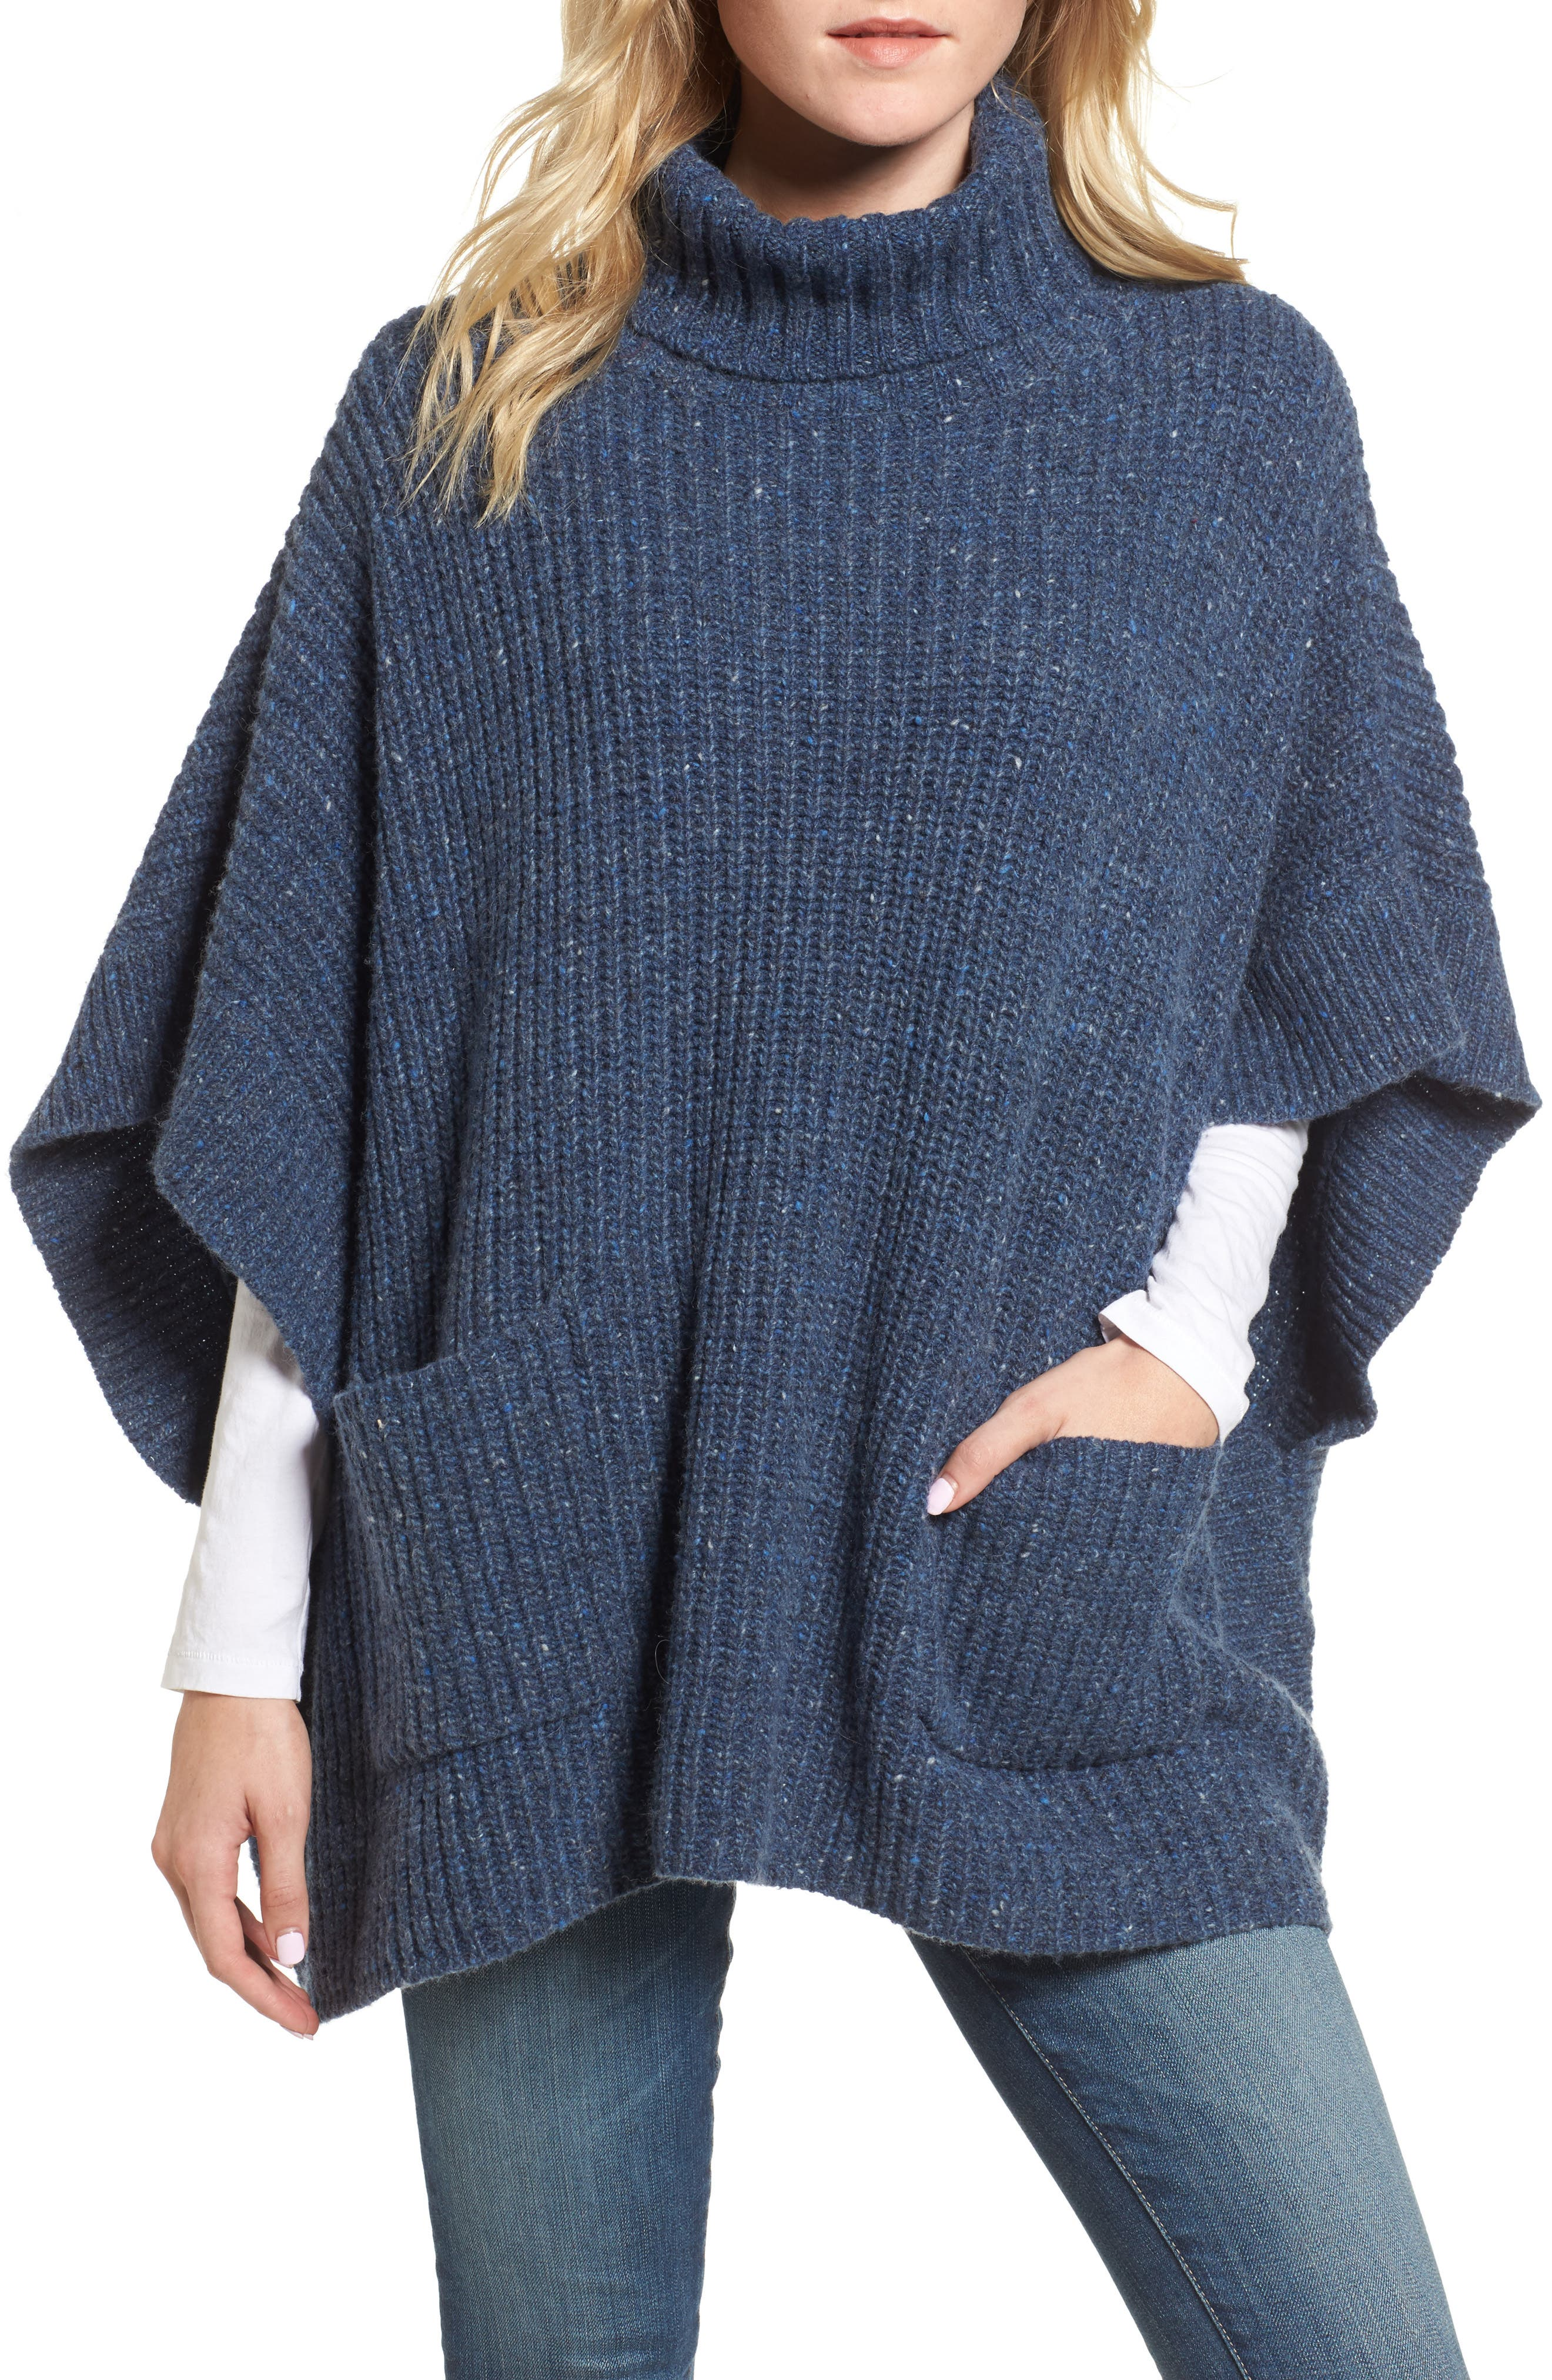 Alternate Image 1 Selected - Rebecca Minkoff Serina Oversize Sweater